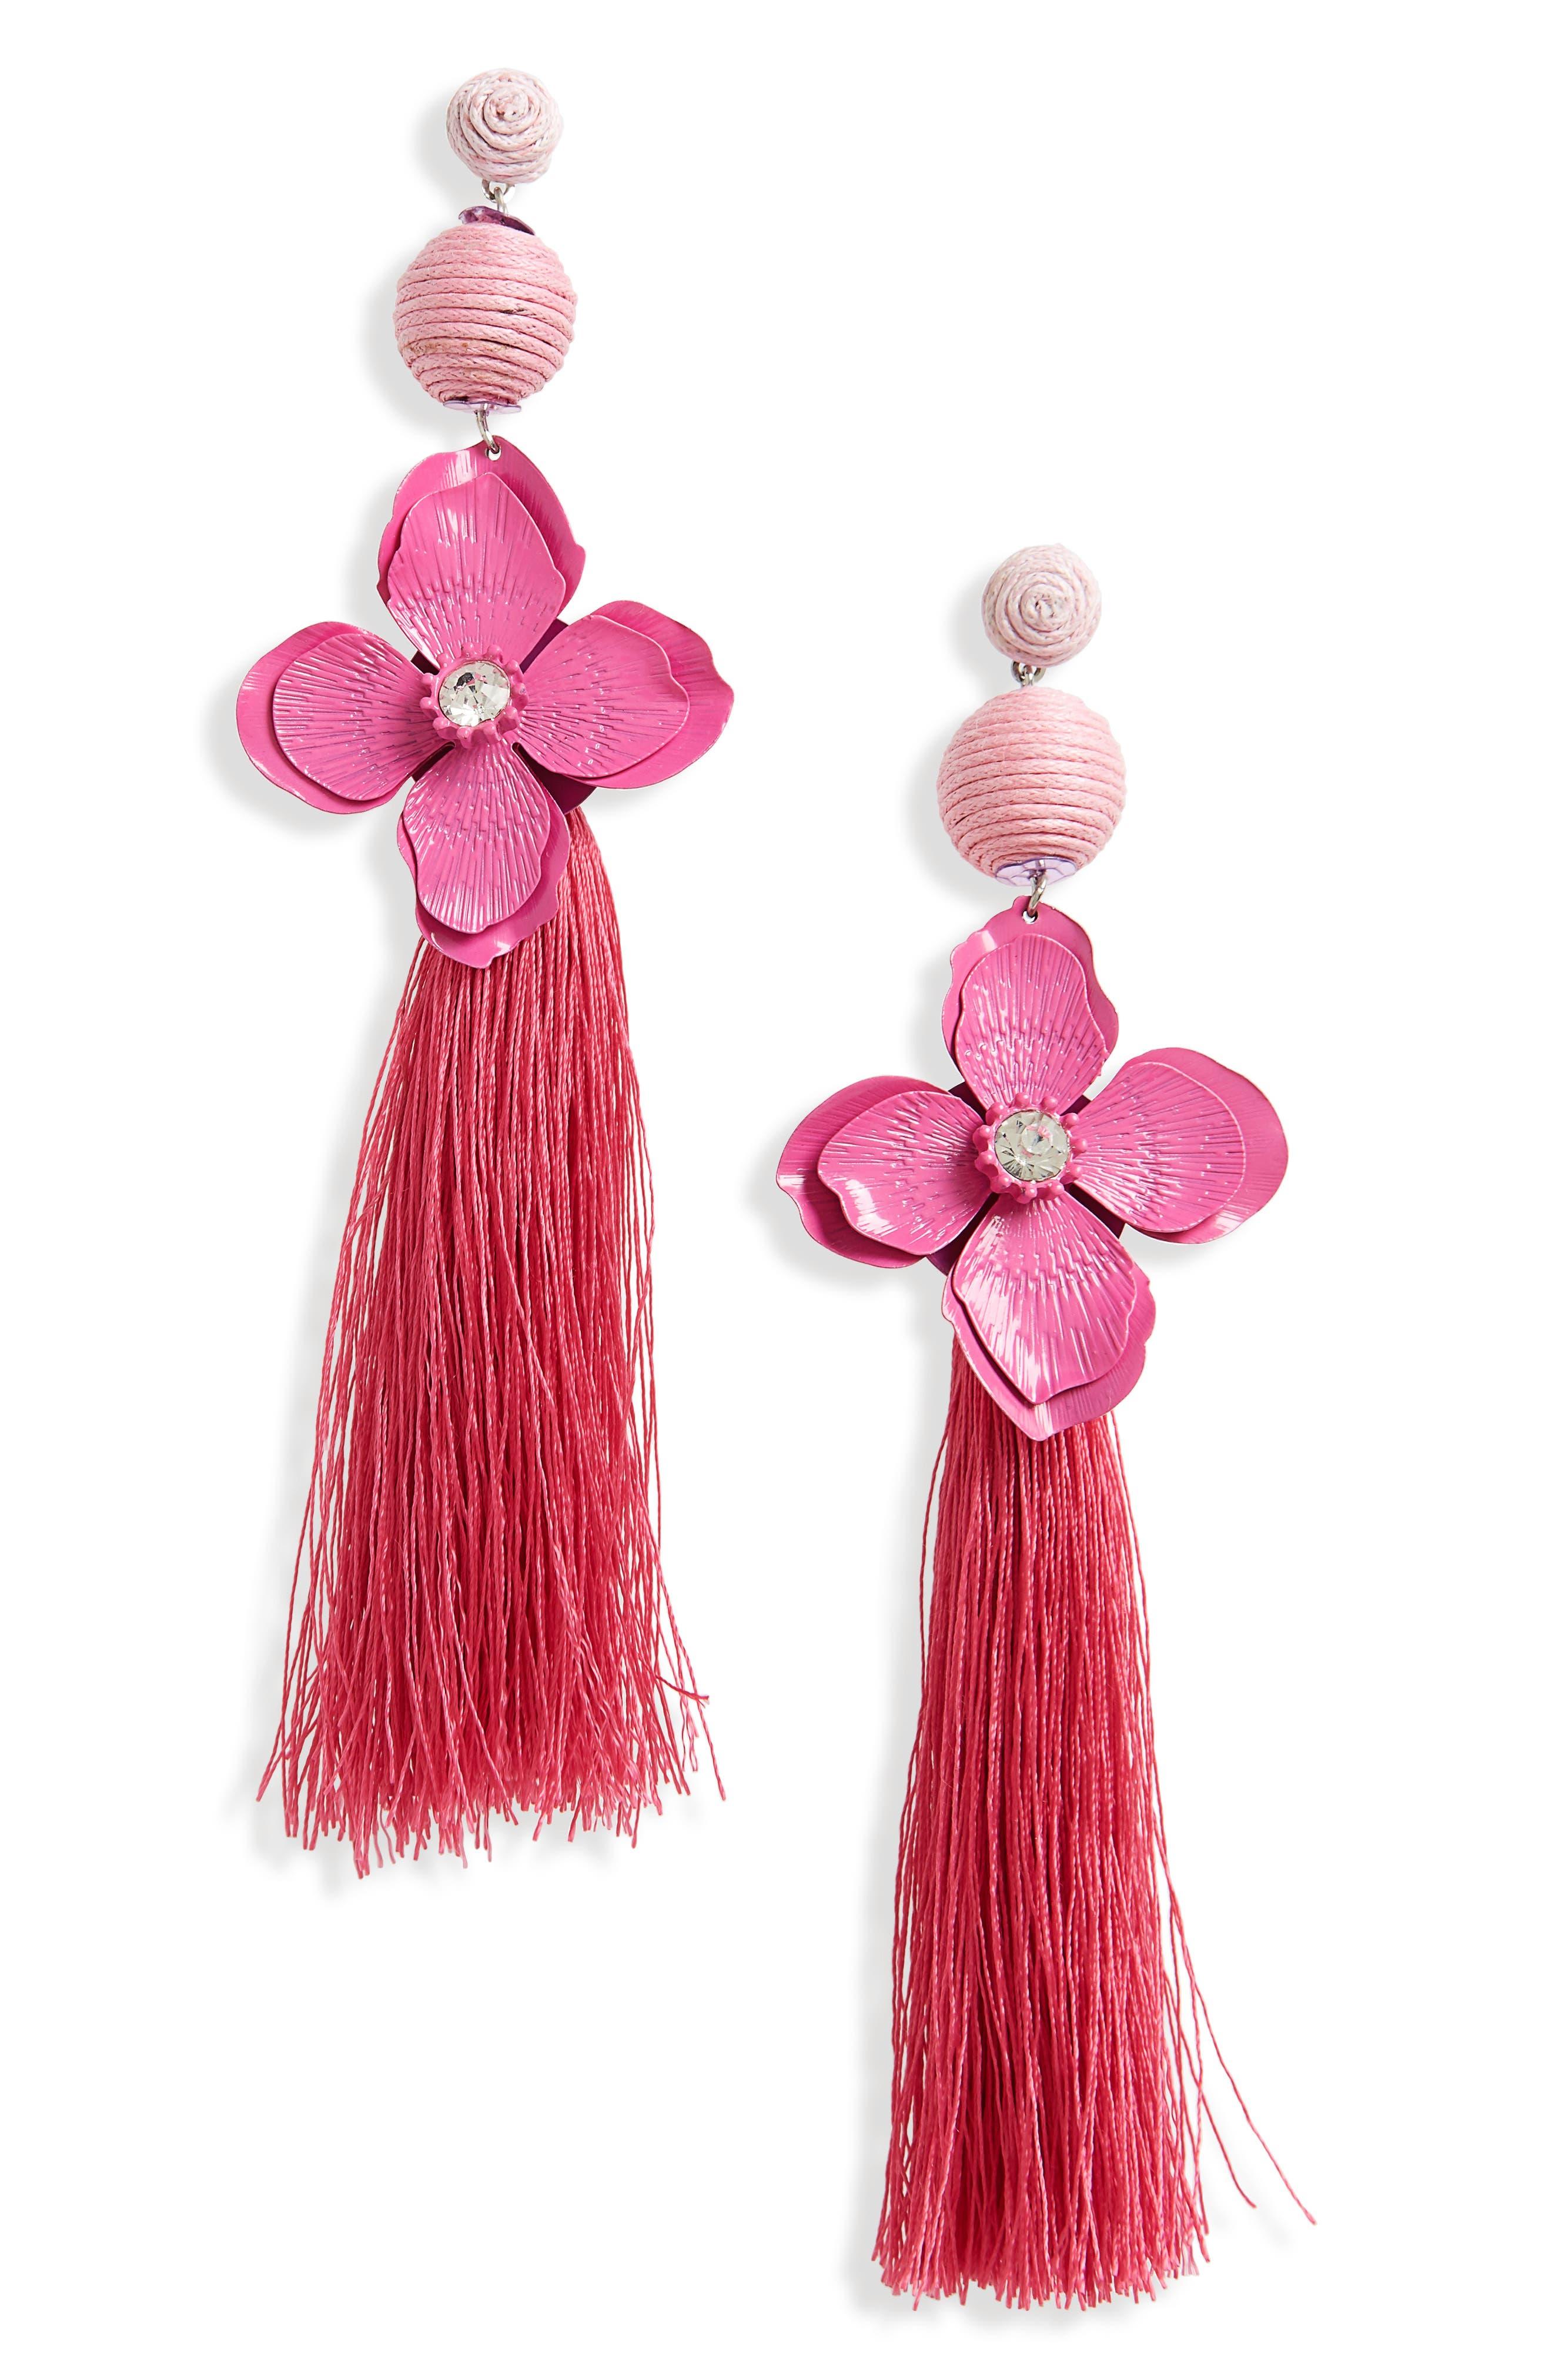 Flower Tassel Drop Earrings,                             Main thumbnail 1, color,                             690